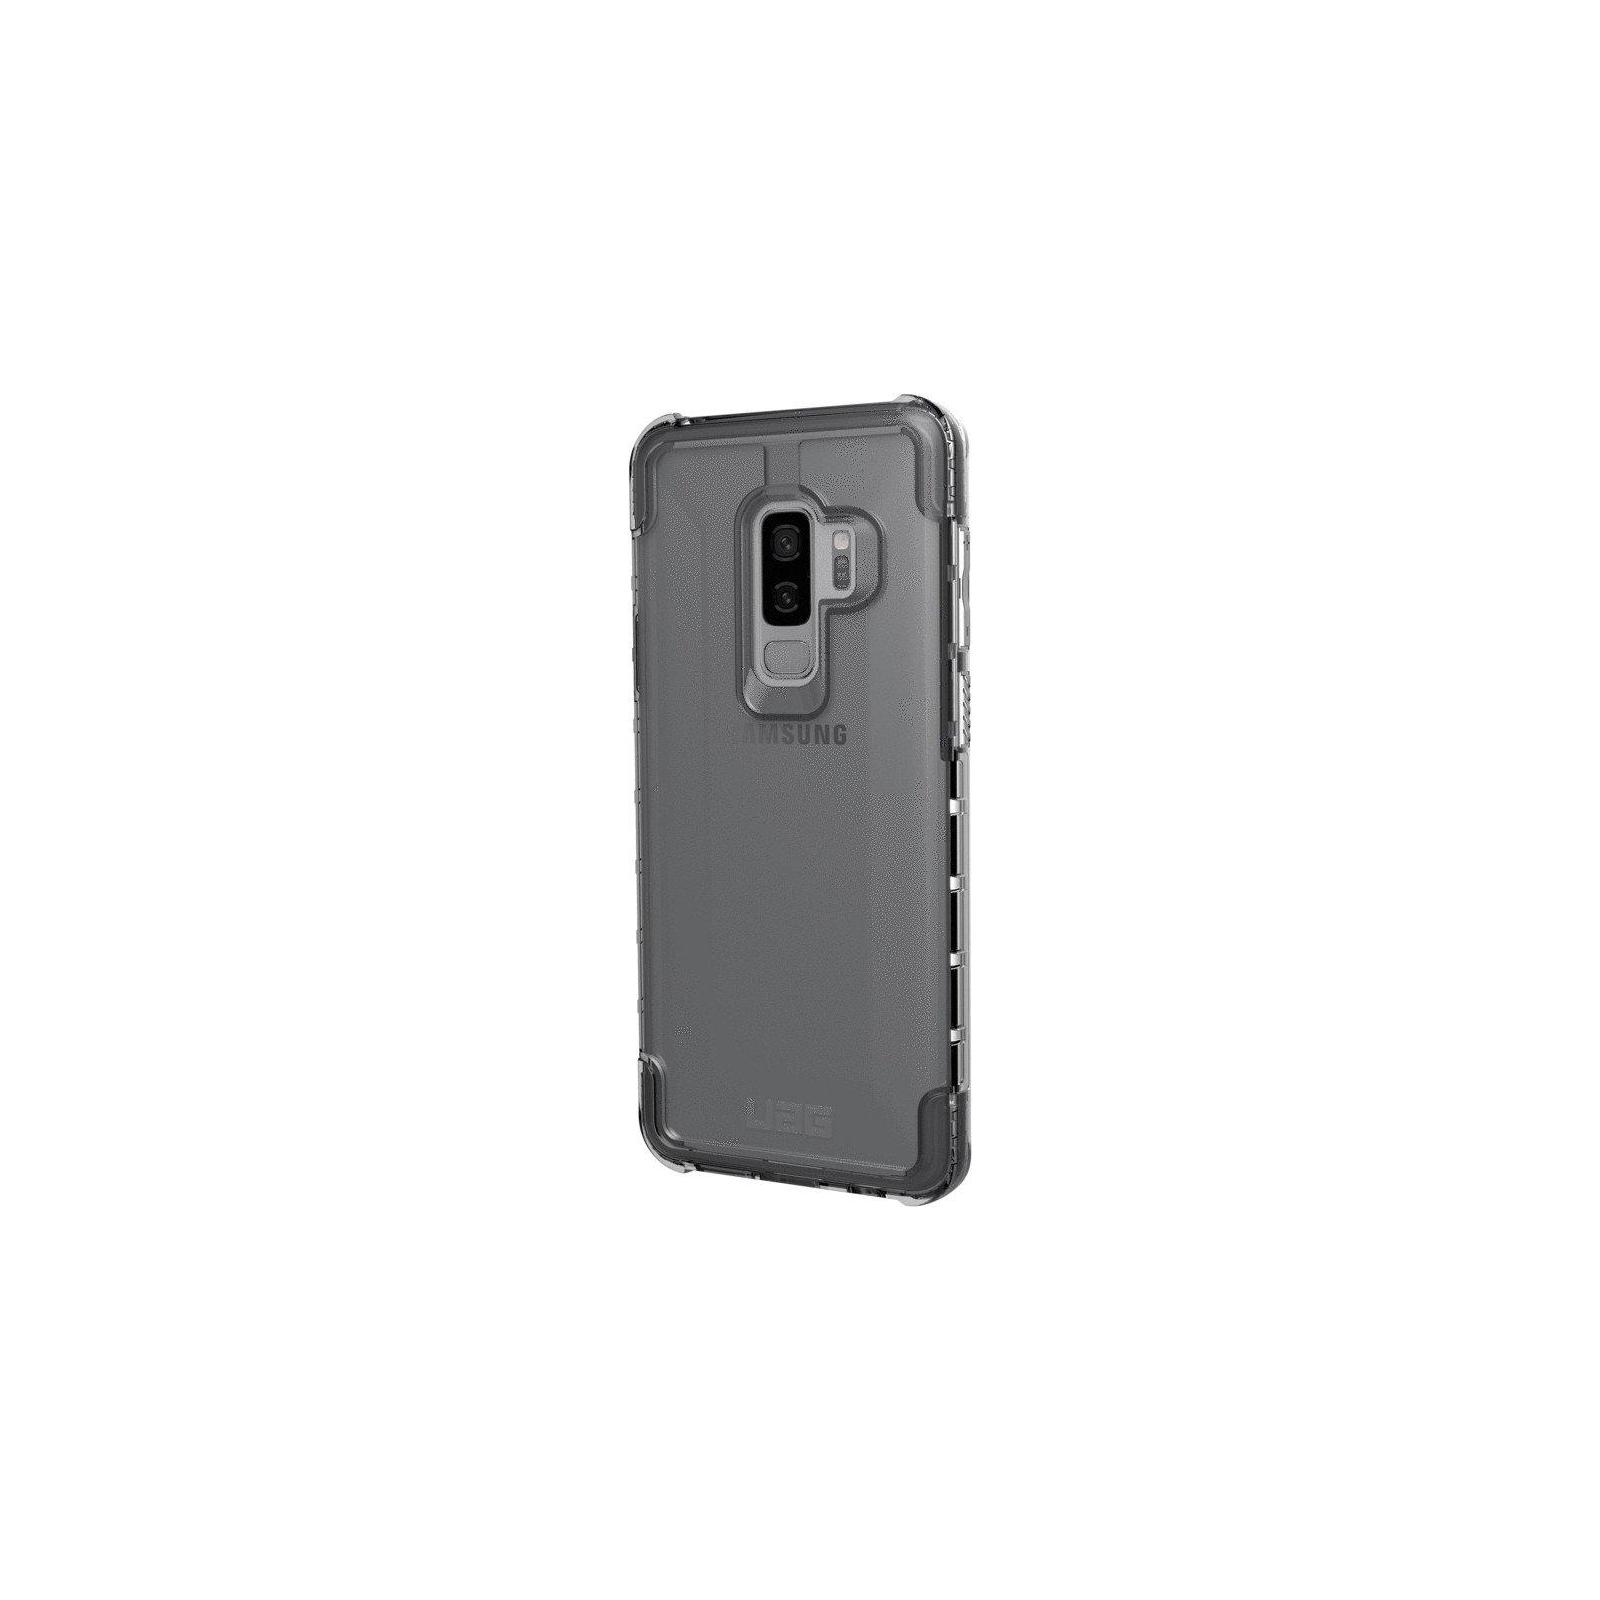 Чехол для моб. телефона UAG Galaxy S9+ Plyo Ice (GLXS9PLS-Y-IC) изображение 3